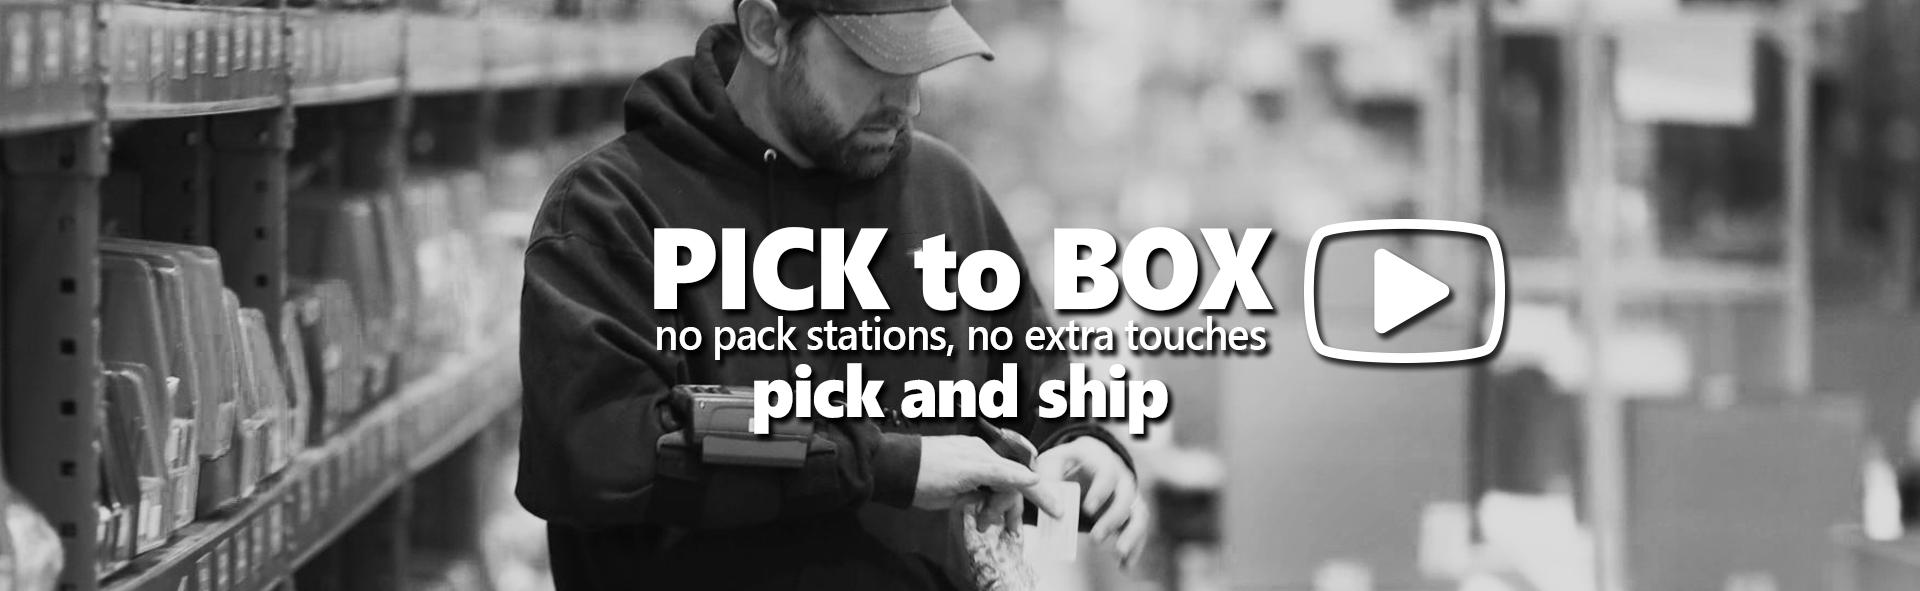 pick to box video